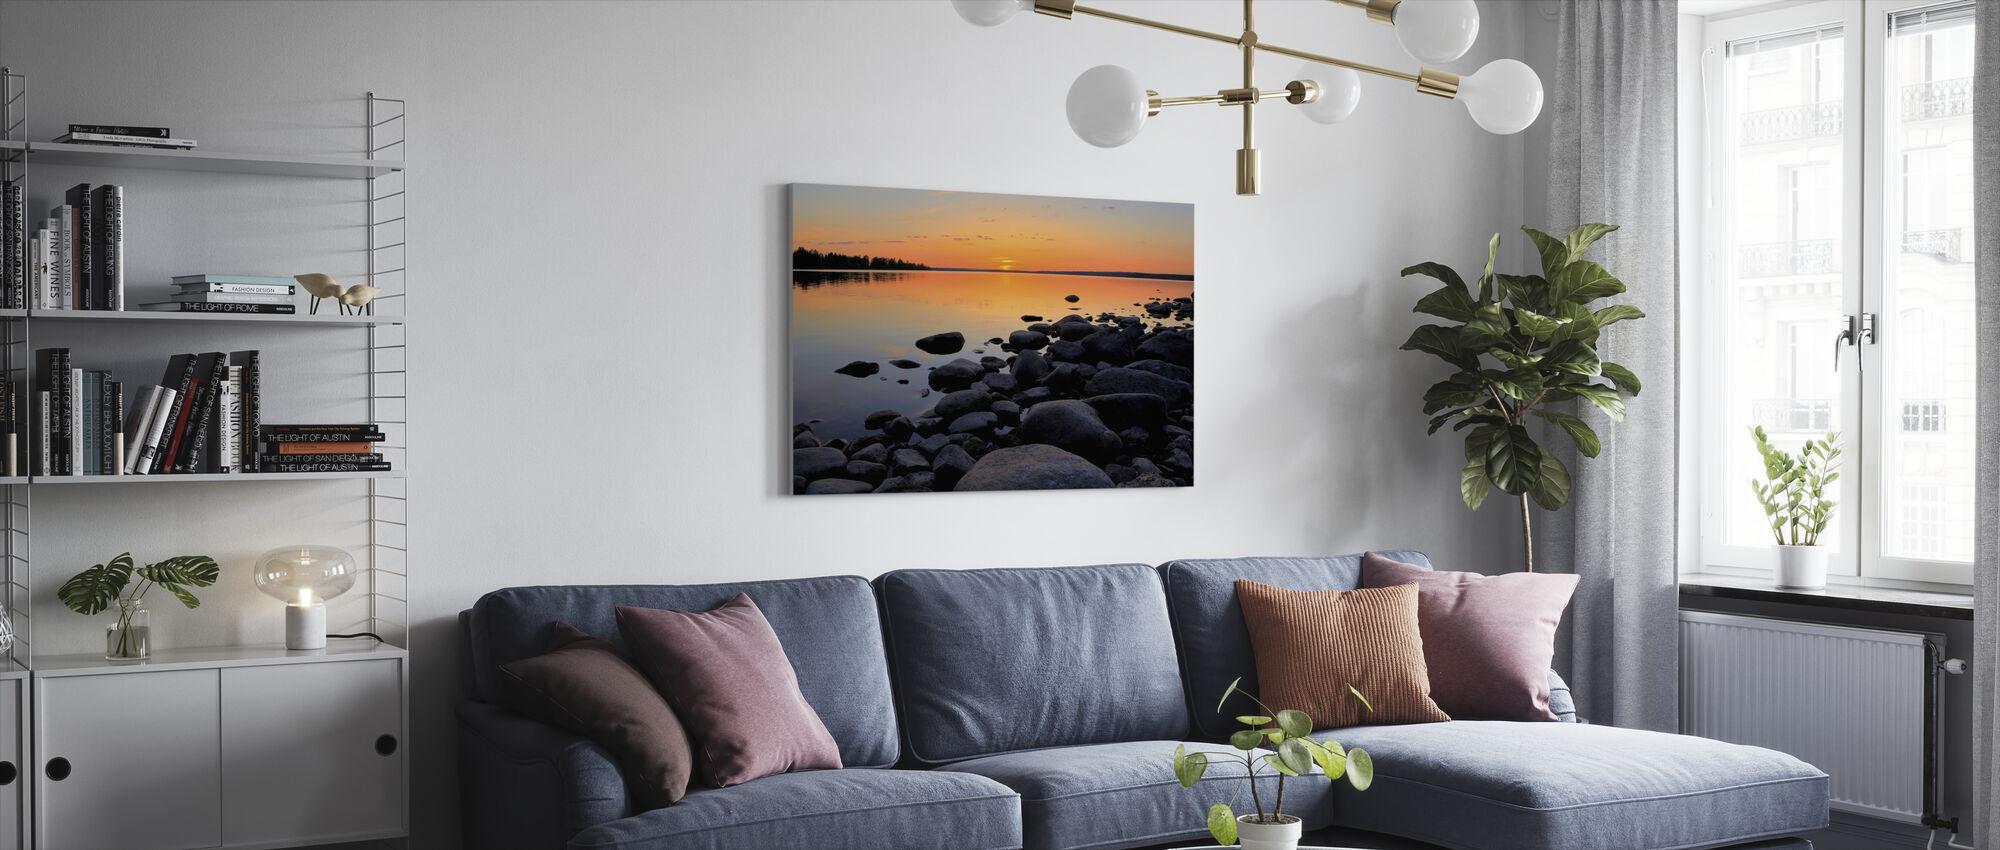 Nord-Sverige Midnattsol - Lerretsbilde - Stue